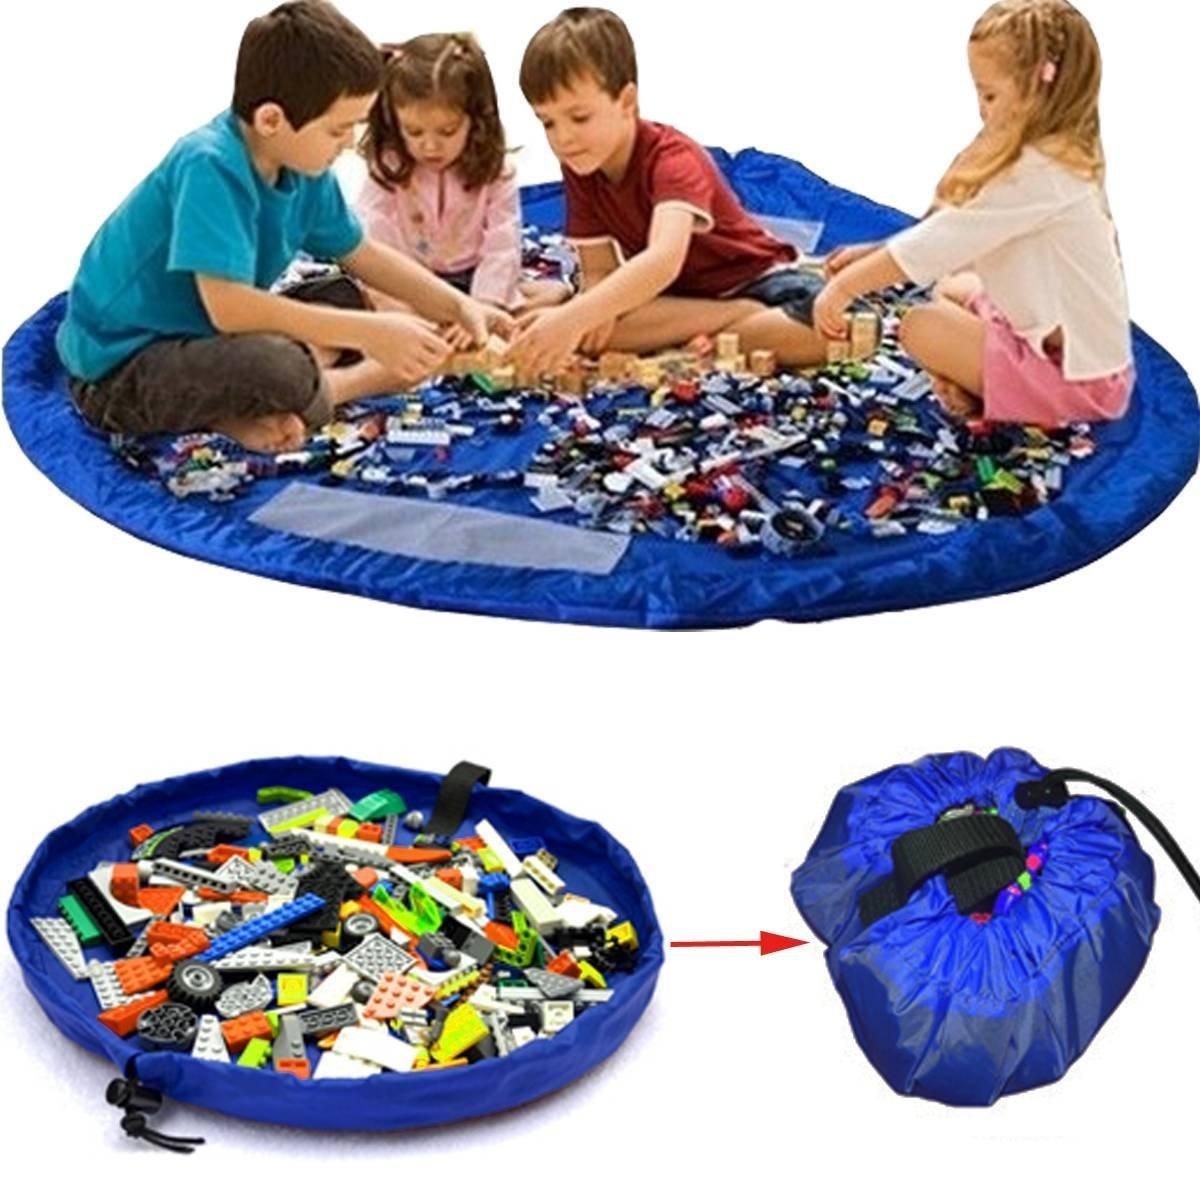 Redlution Toy Storage Bag grande borsa Tidy Lego Mat Portable Kids Toys organizer portaoggetti sacca tappetino gioco 150cm blu 152, 4cm